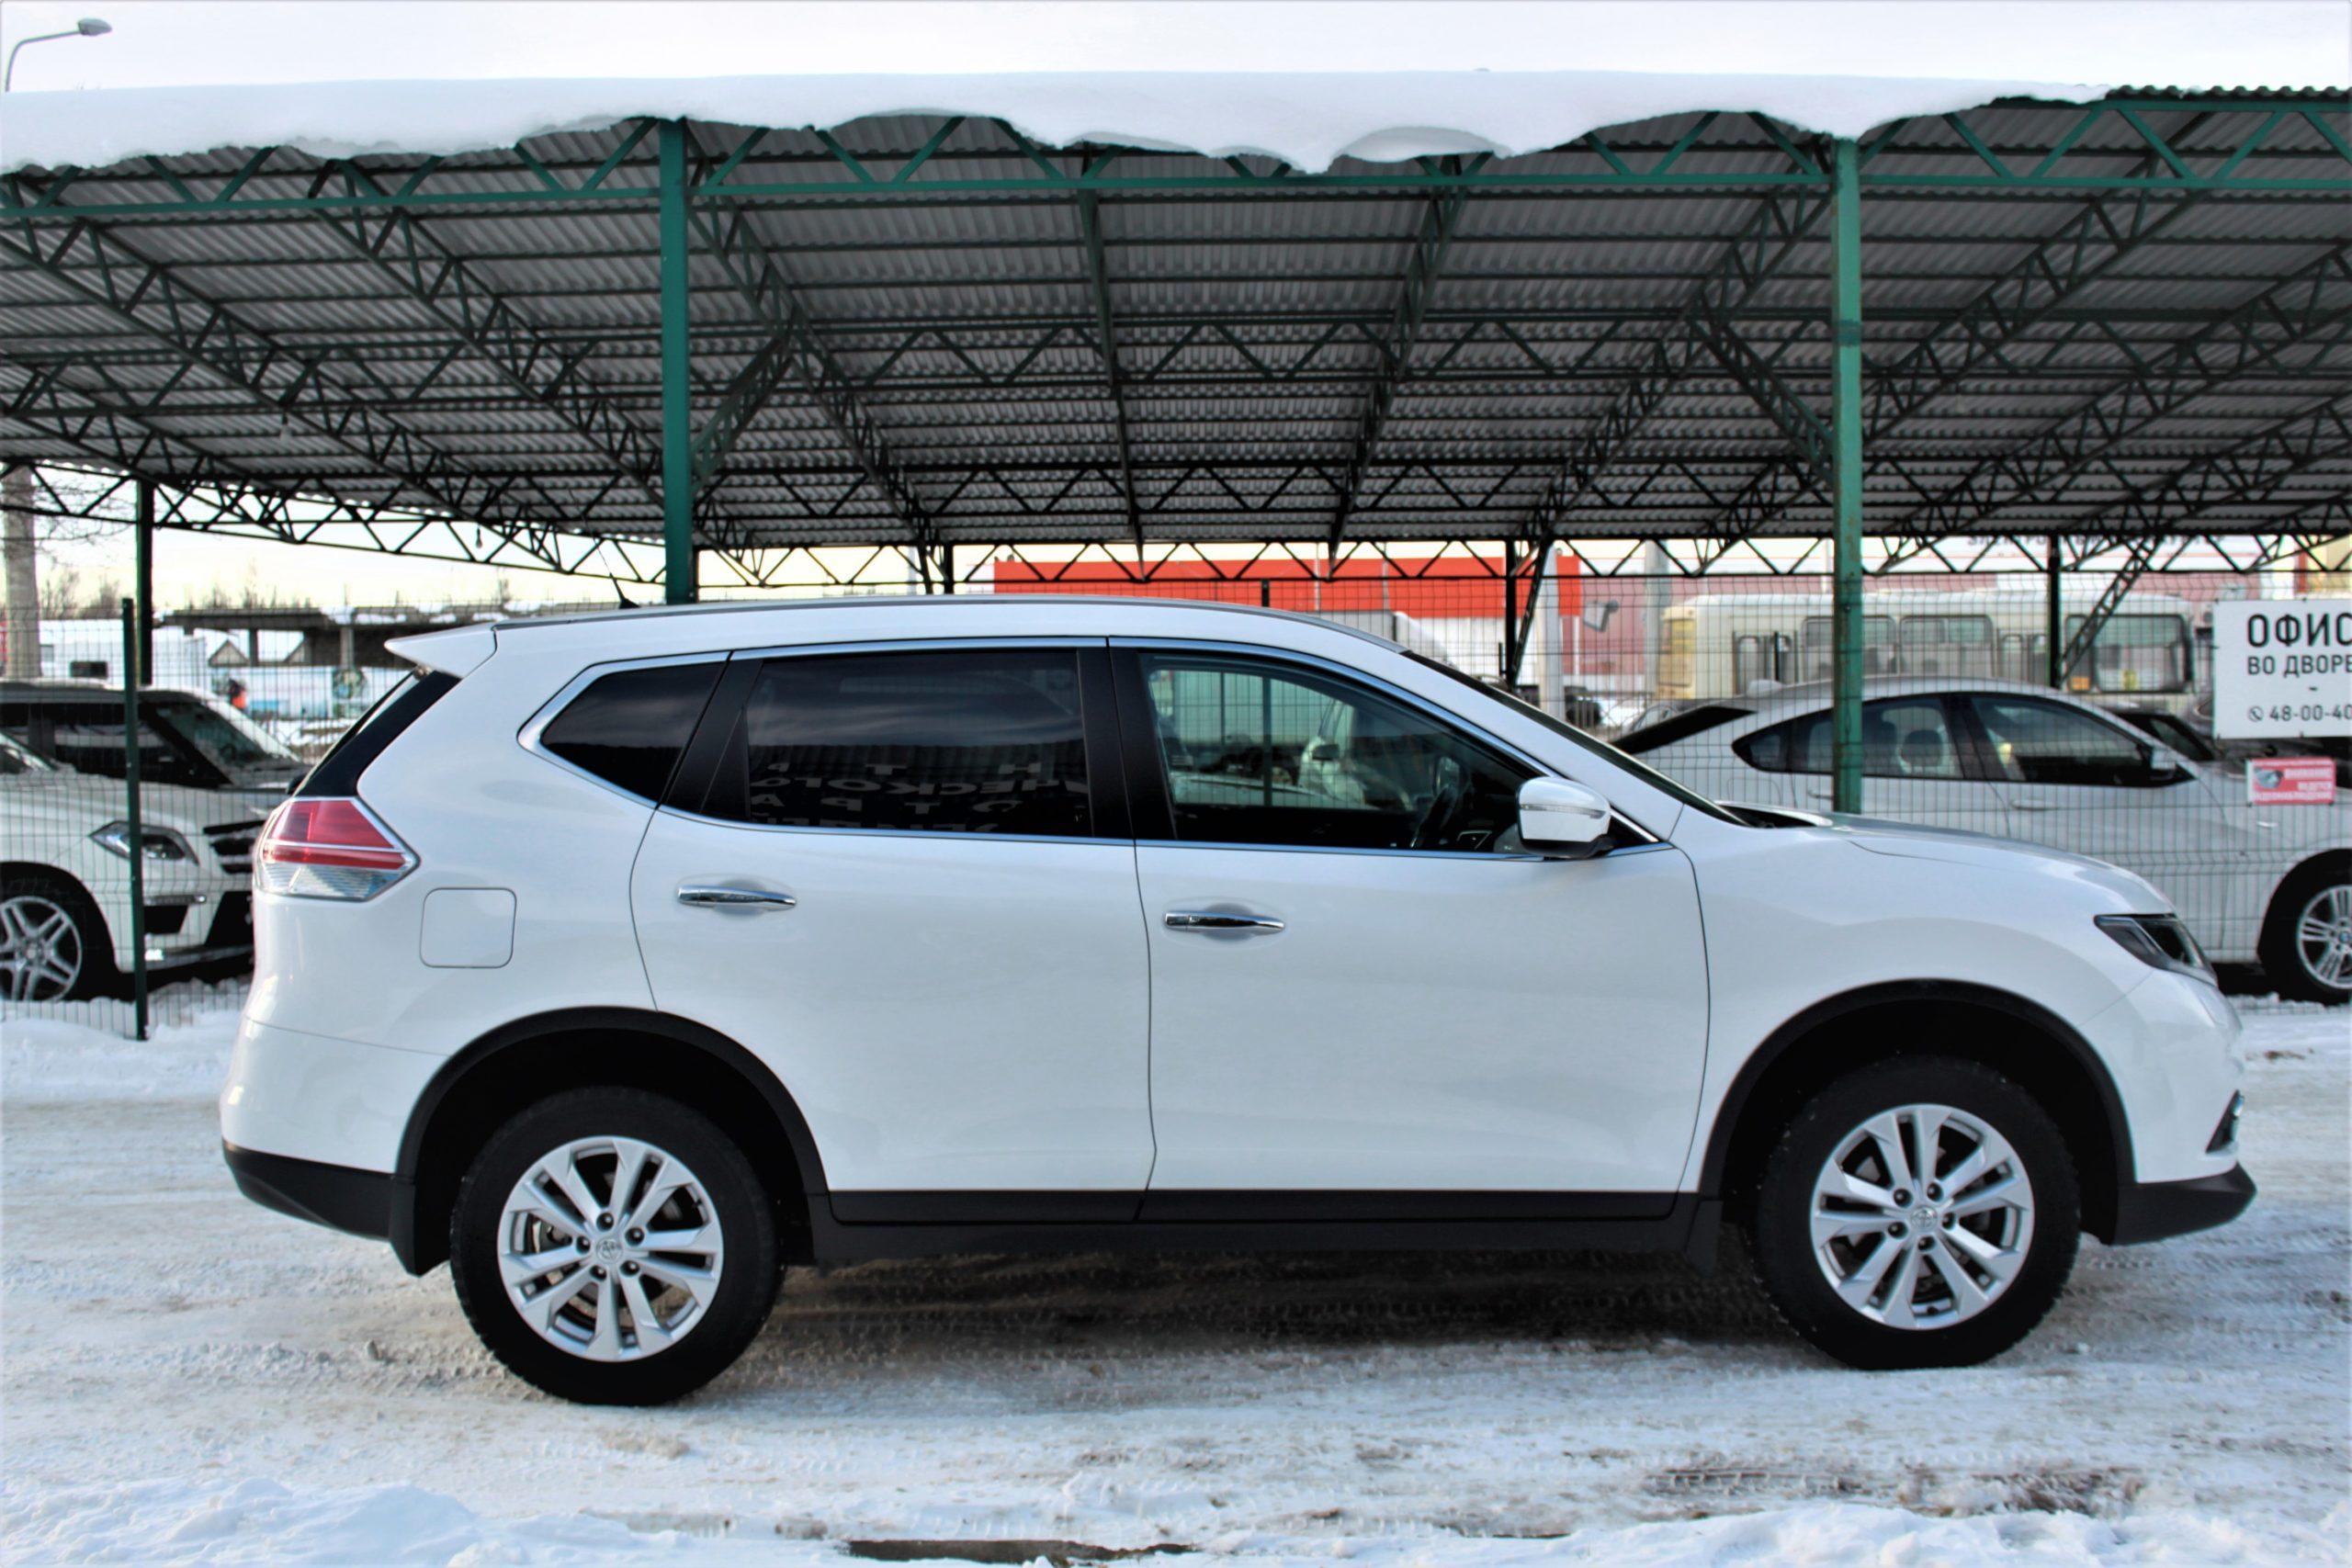 Купить Nissan X-Trail (Белый) - Автопарк Ставрополь